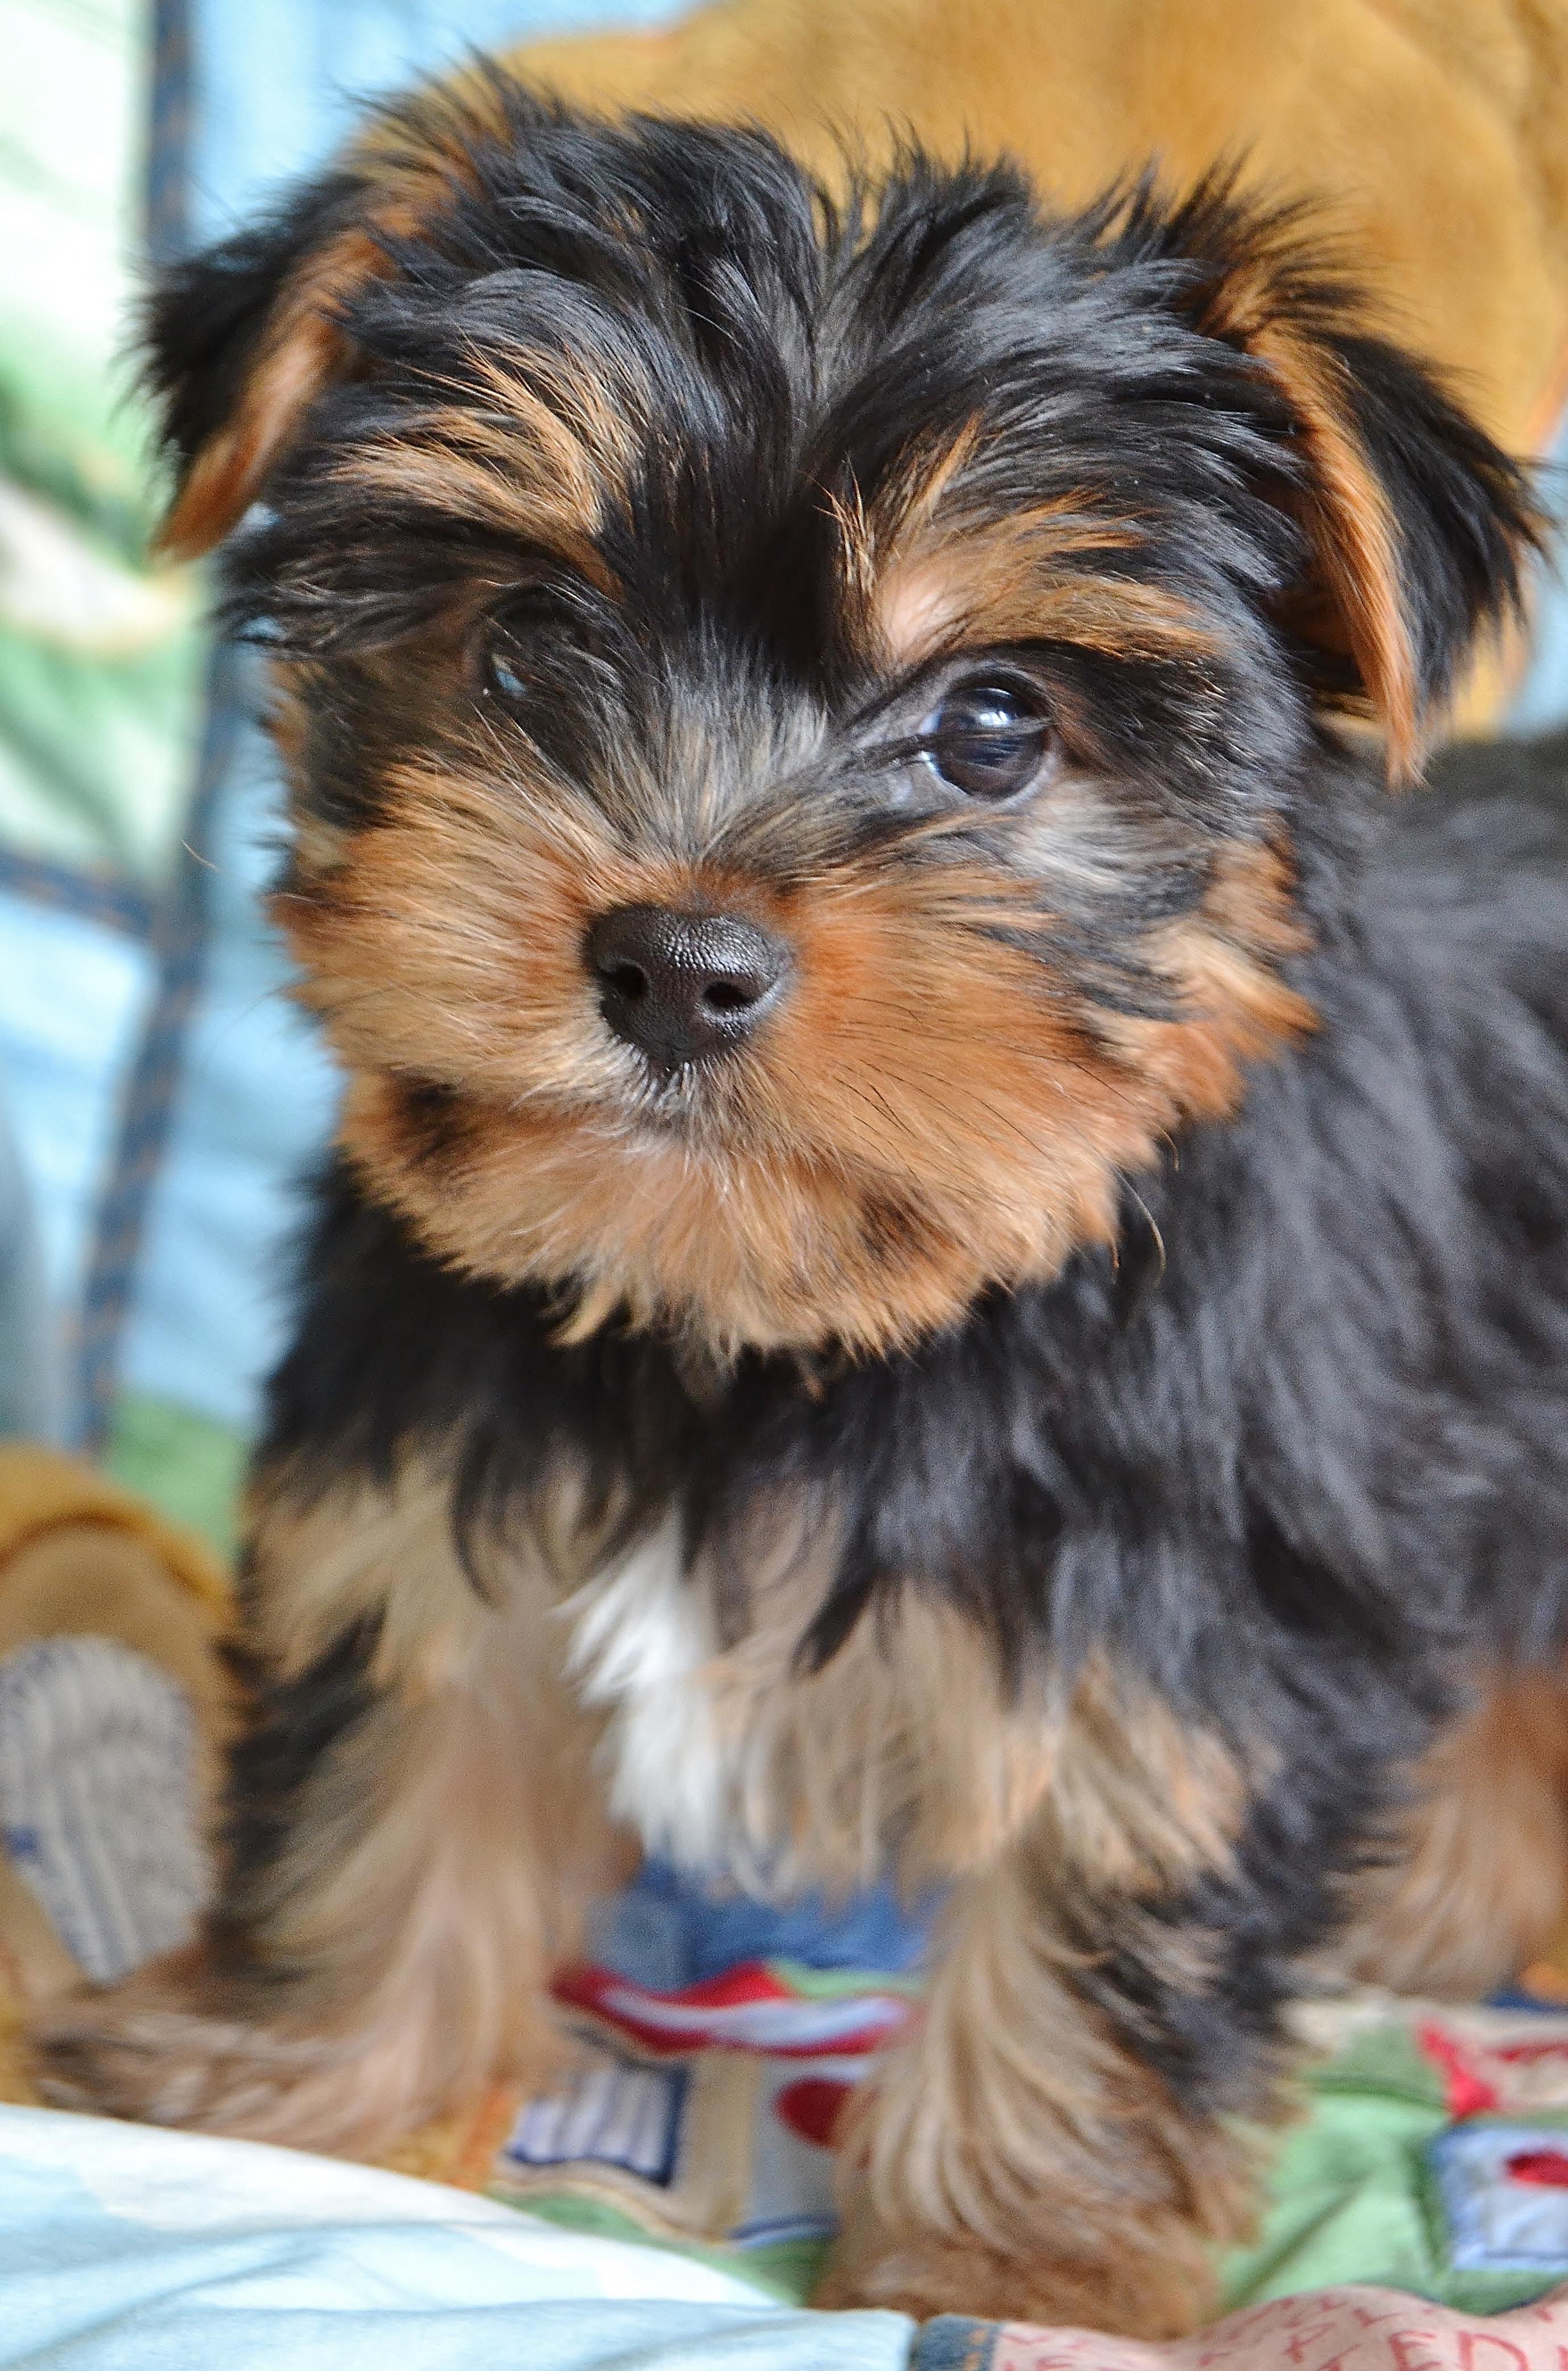 Nj Puppy Store Bergen County New Jersey 201 773 8280